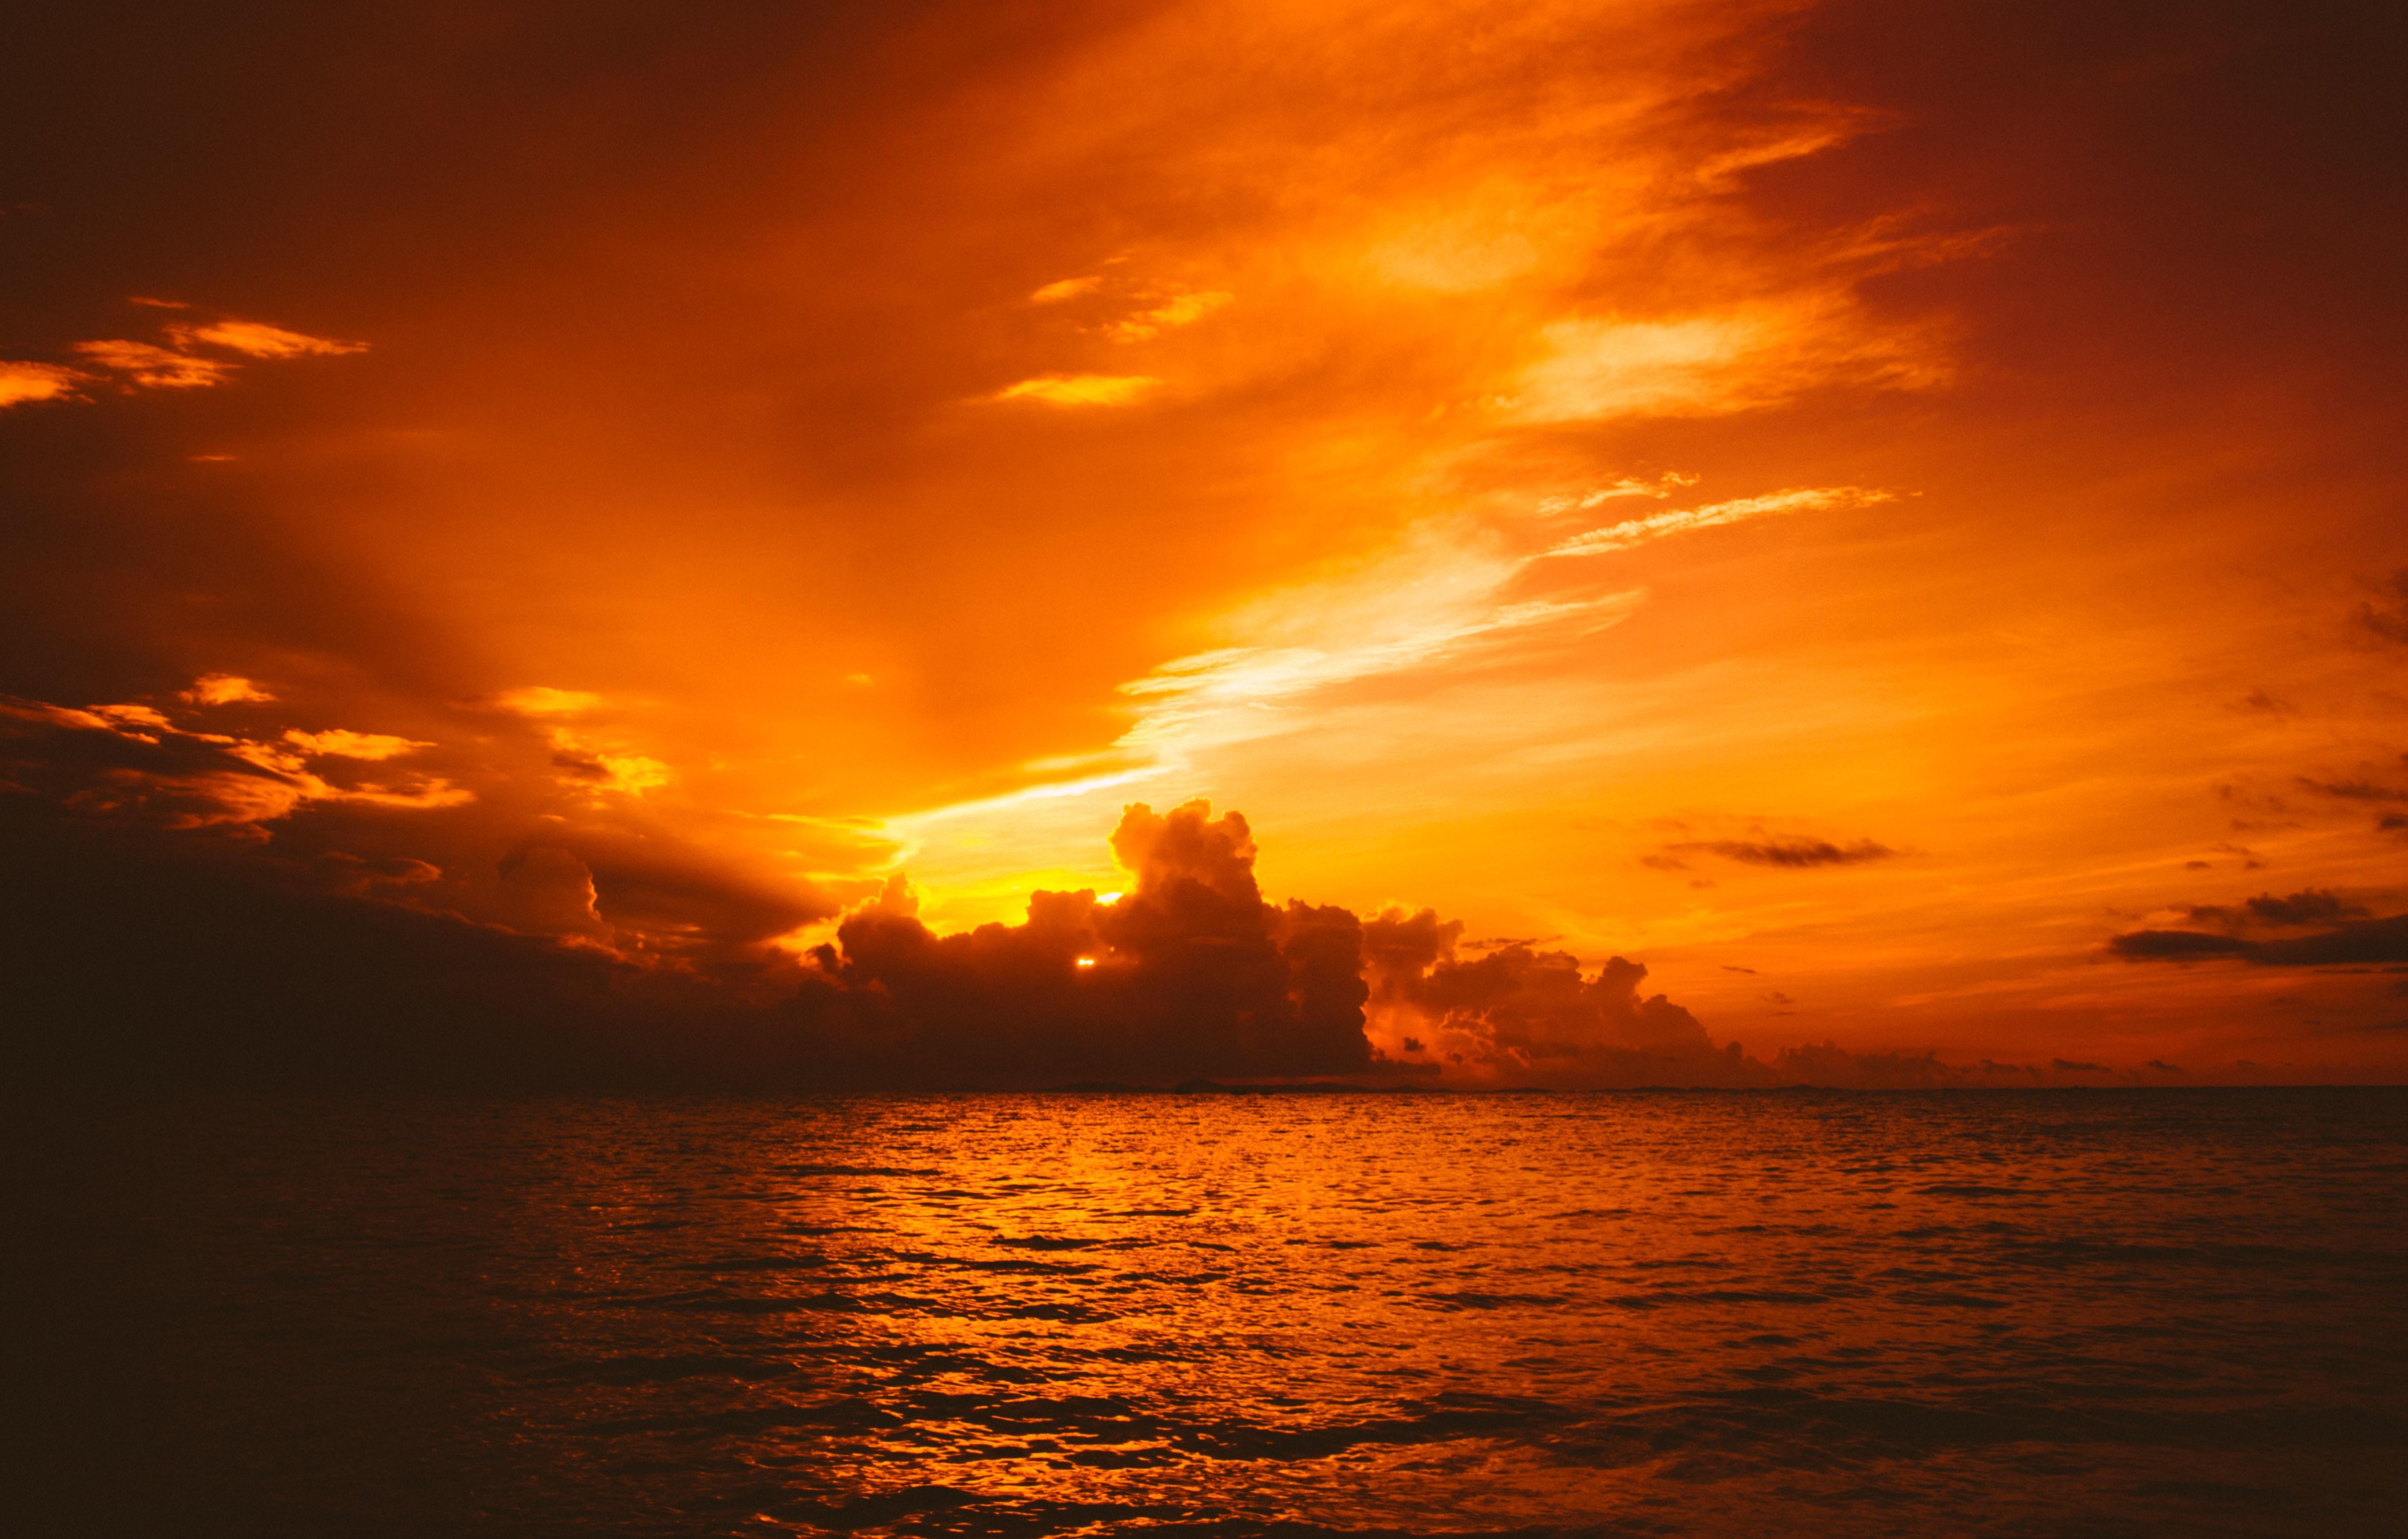 каталоге компании картинки оранжевое небо оранжевое море свадебную